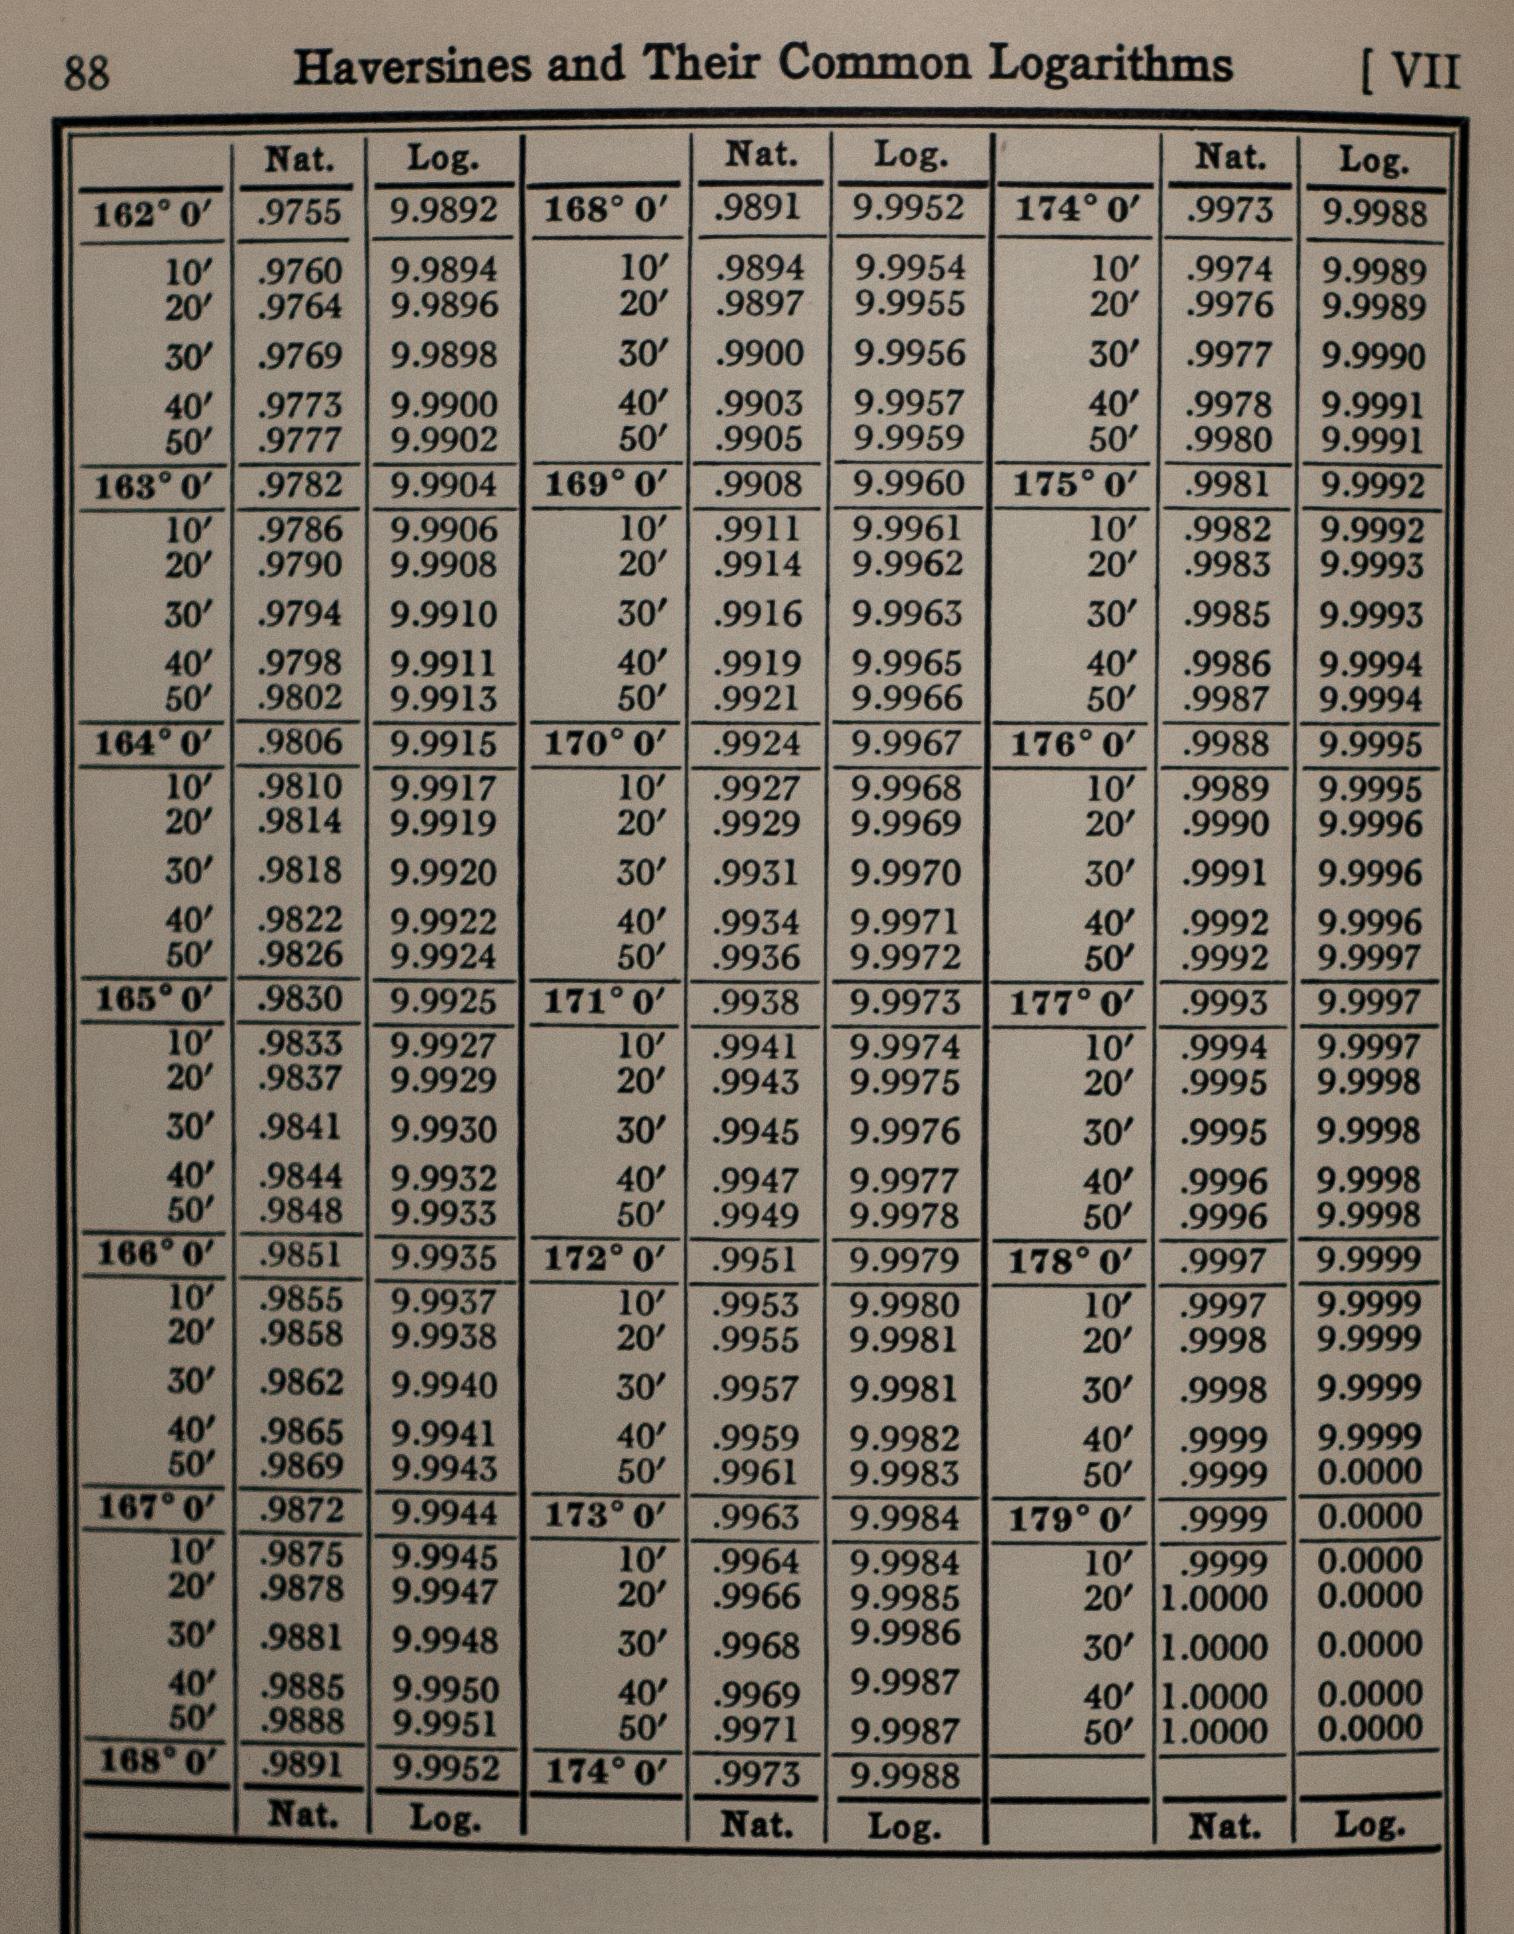 Sight Reduction Tables 229 Vol.4 Latitudes 45 - 60, Inclusive